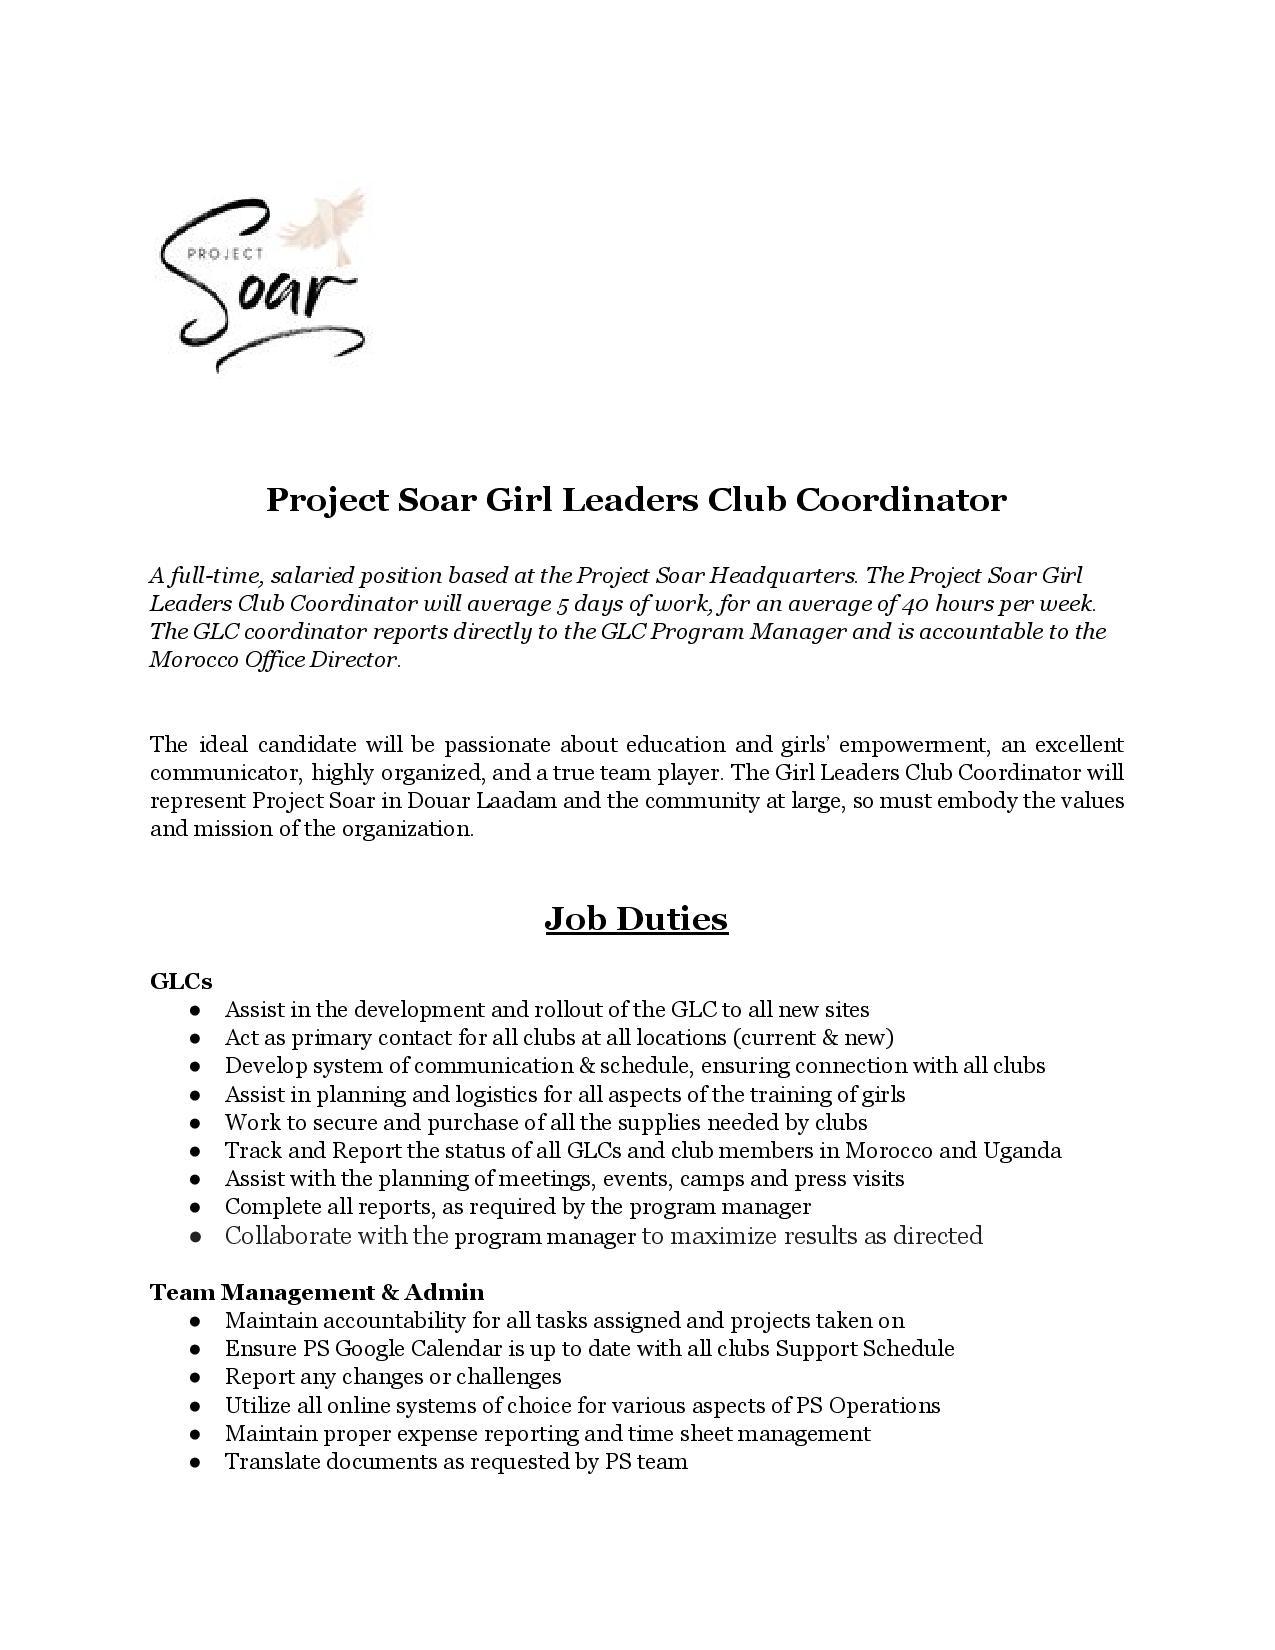 Project Soar Girls Leaders Club Coordinator-page-001.jpg